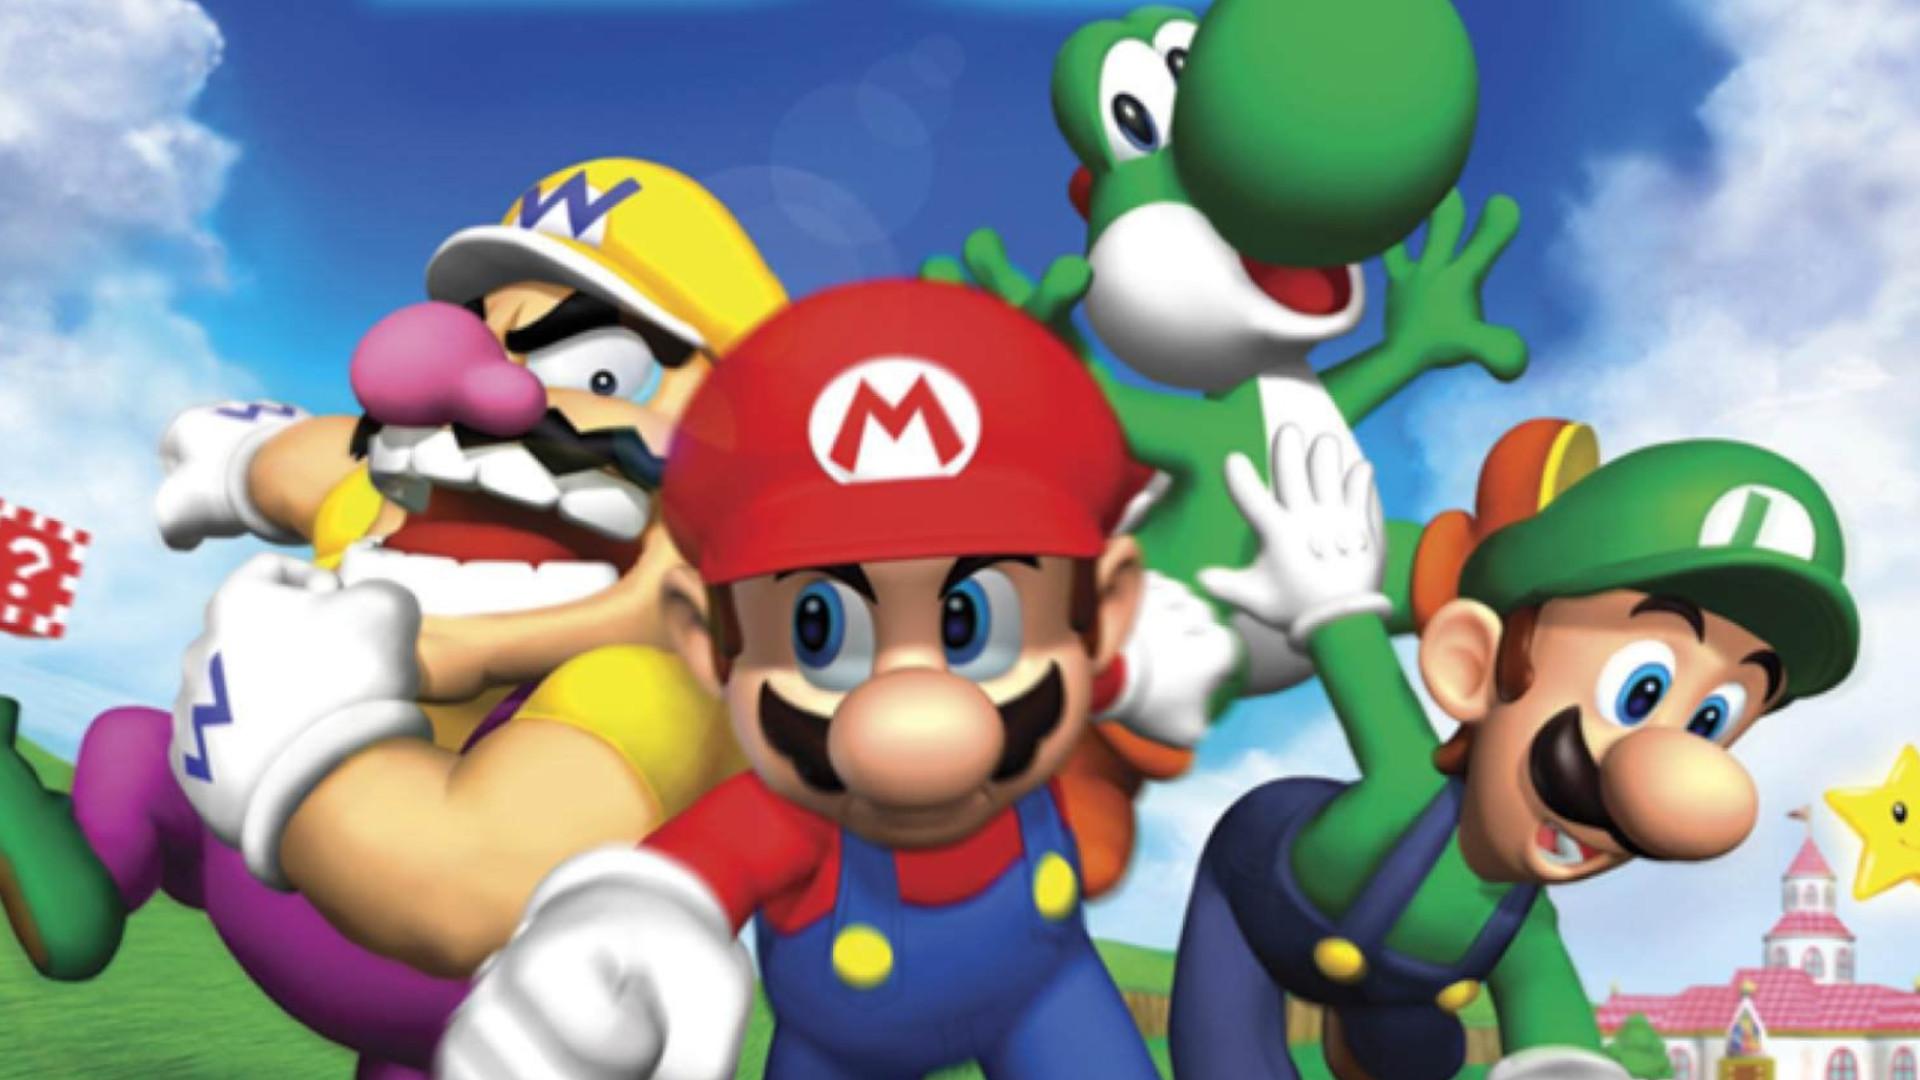 Custom DS emulator adds analog control to Super Mario 64 DS